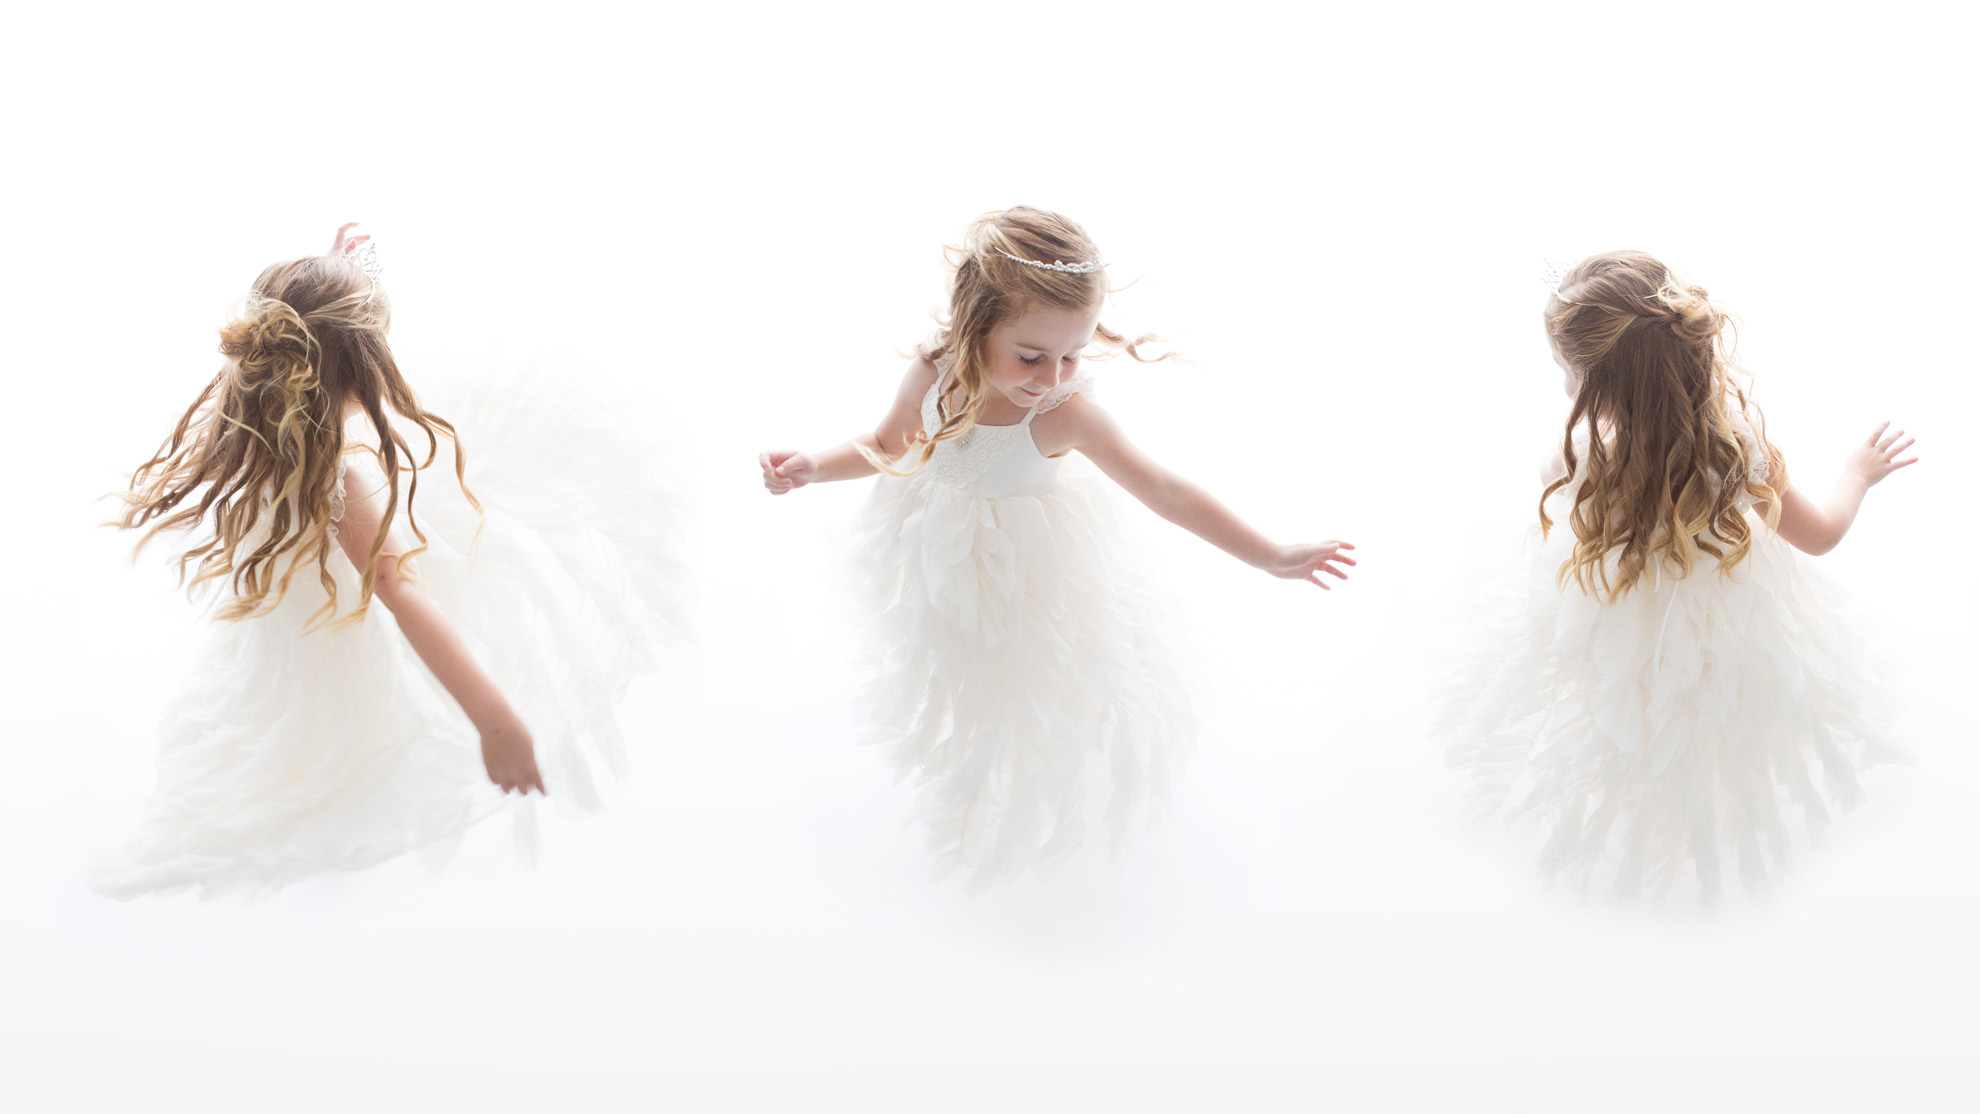 Twirling-photo-shoot.jpg